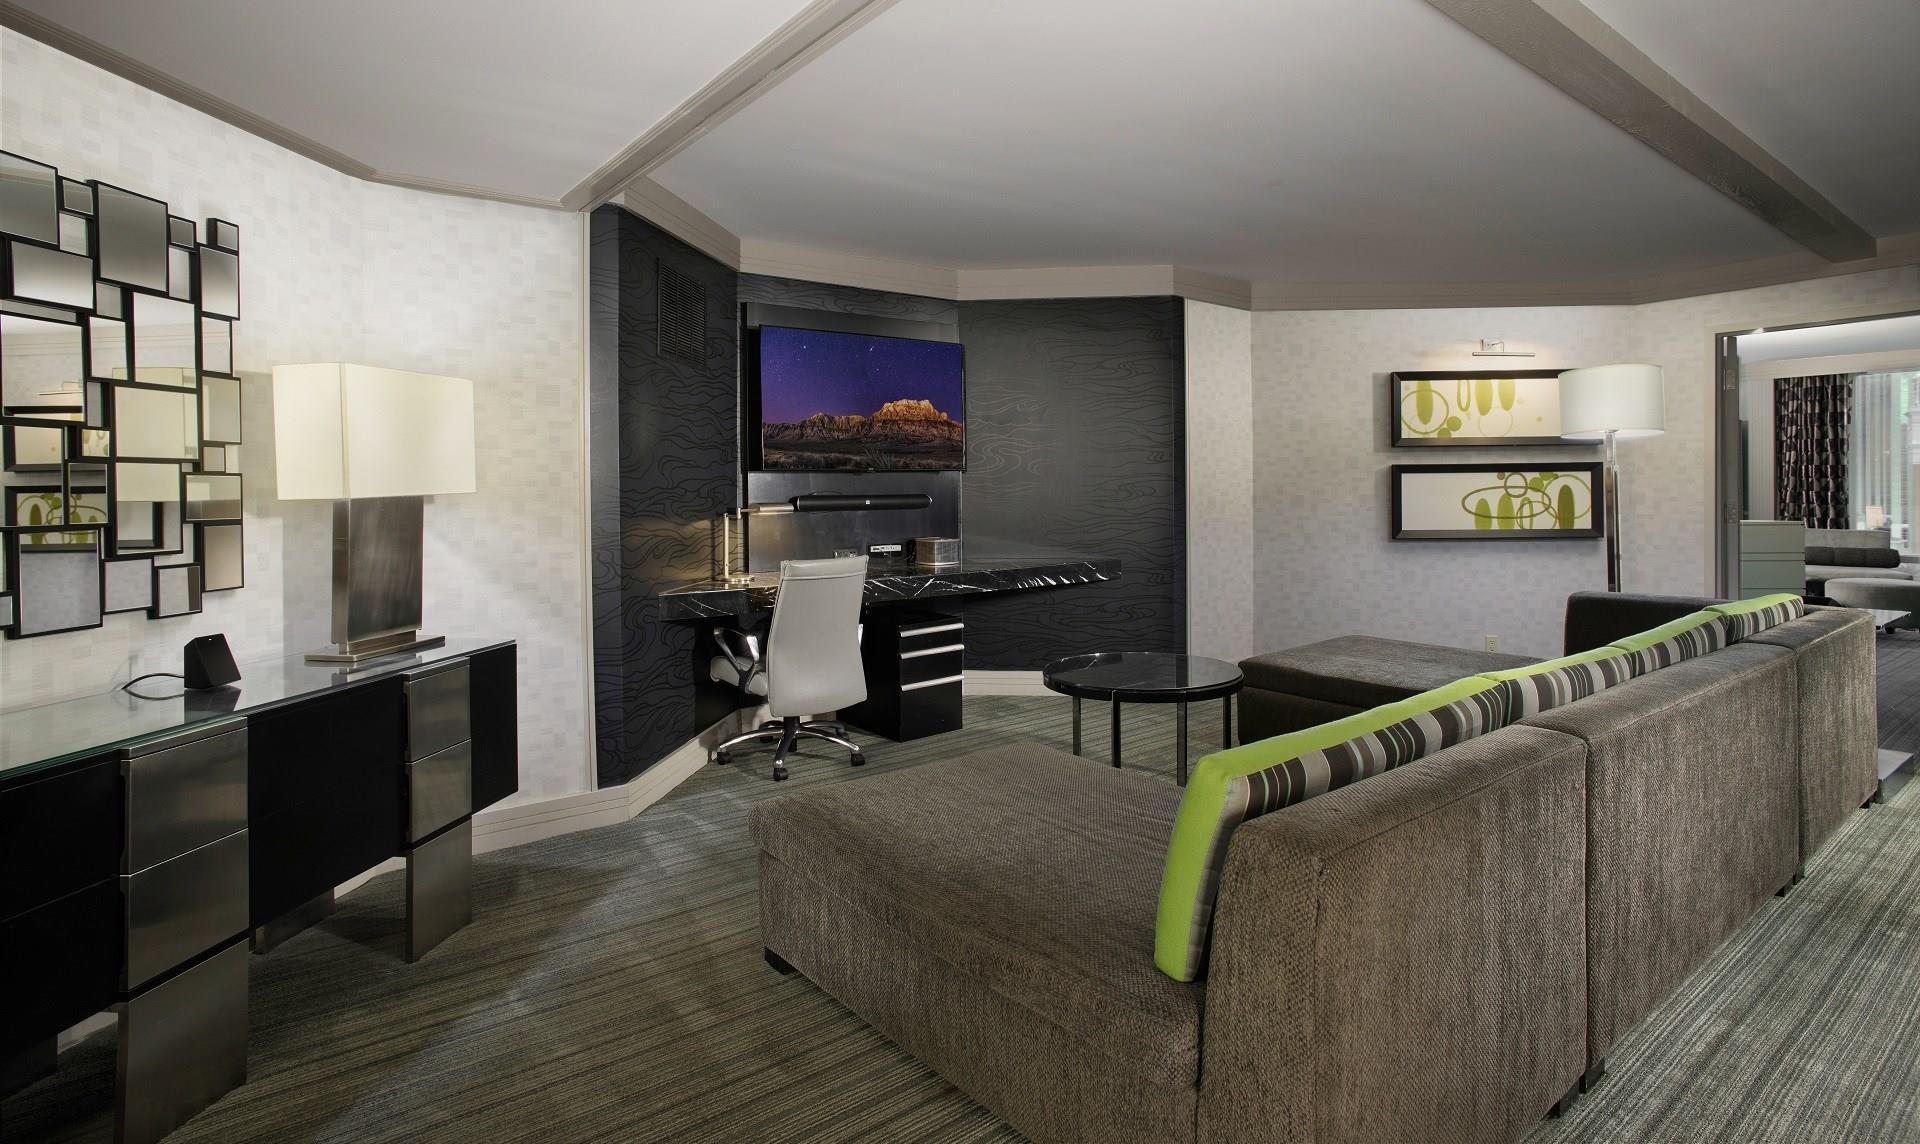 Las Vegas Conference Room Rental